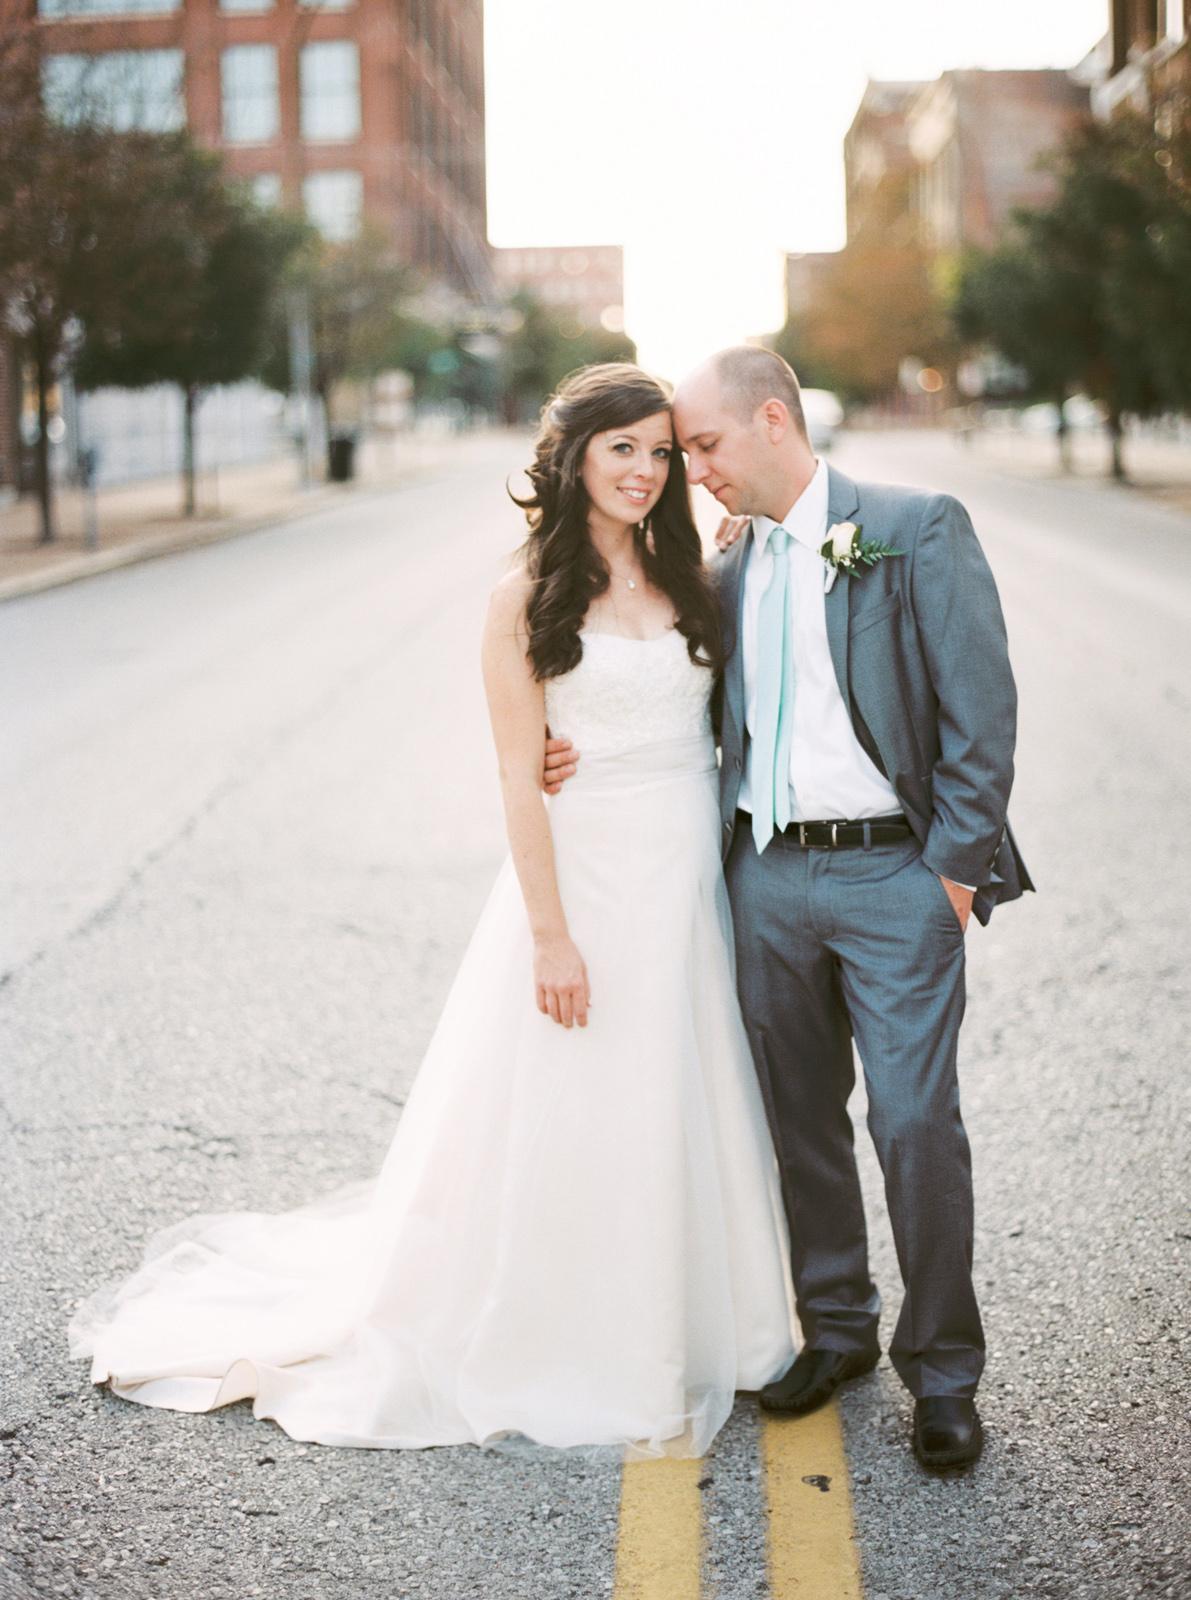 Oldani-Photography-St-Louis-Film-Photographer-Schlafly-Tap-Room-Wedding-Reception8603_13.jpg